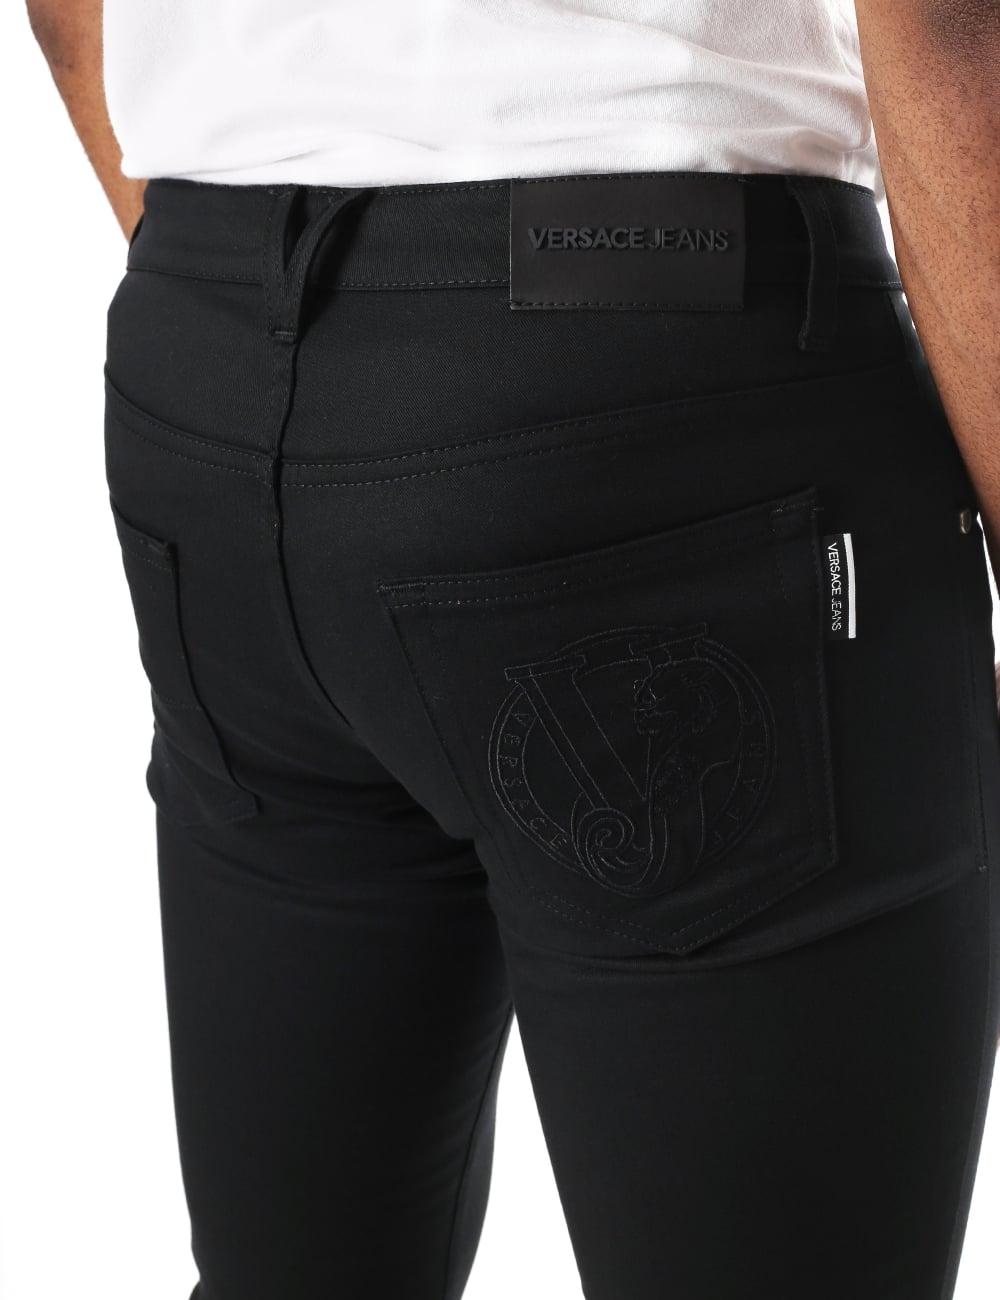 be4021b6 Versace Jeans Men's Slim Fit Jean